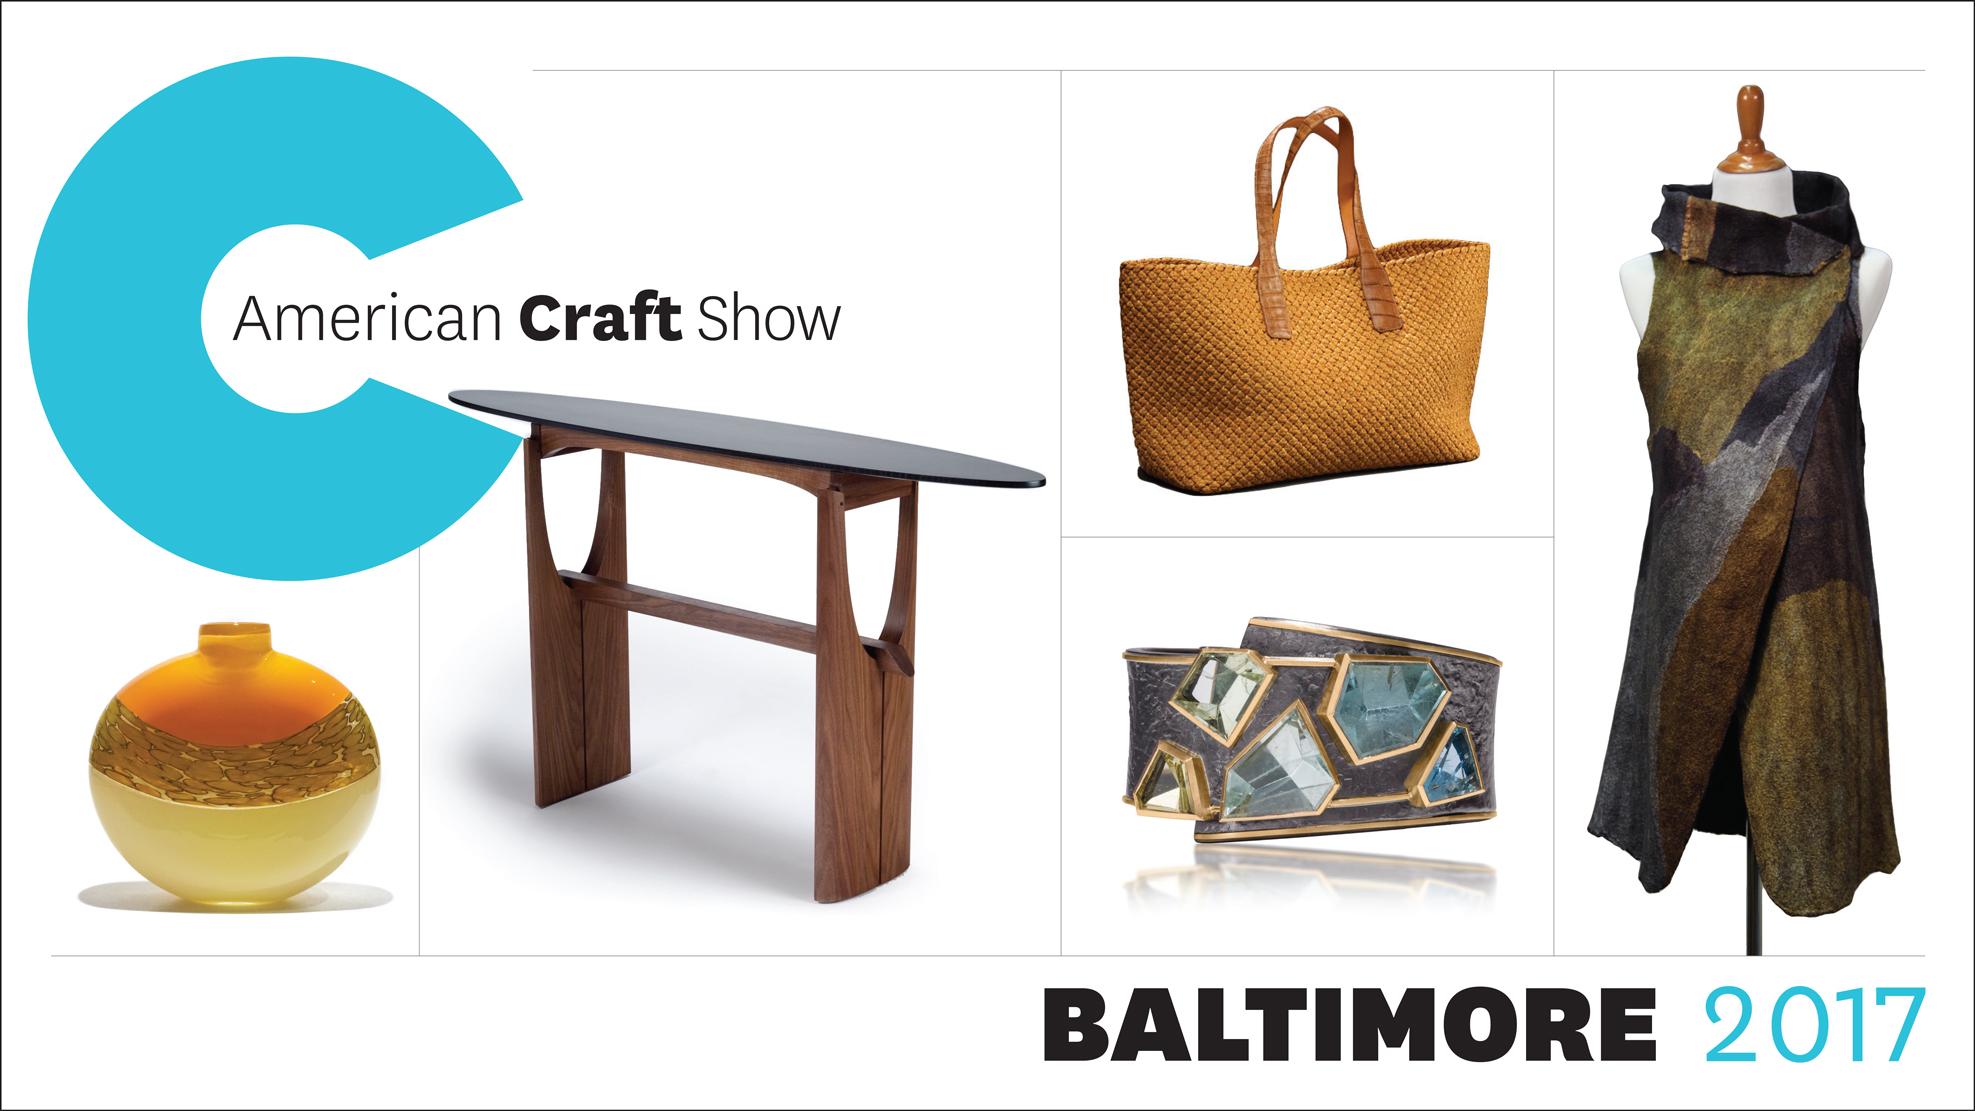 American craft show baltimore 2017 american craft council for American craft council show